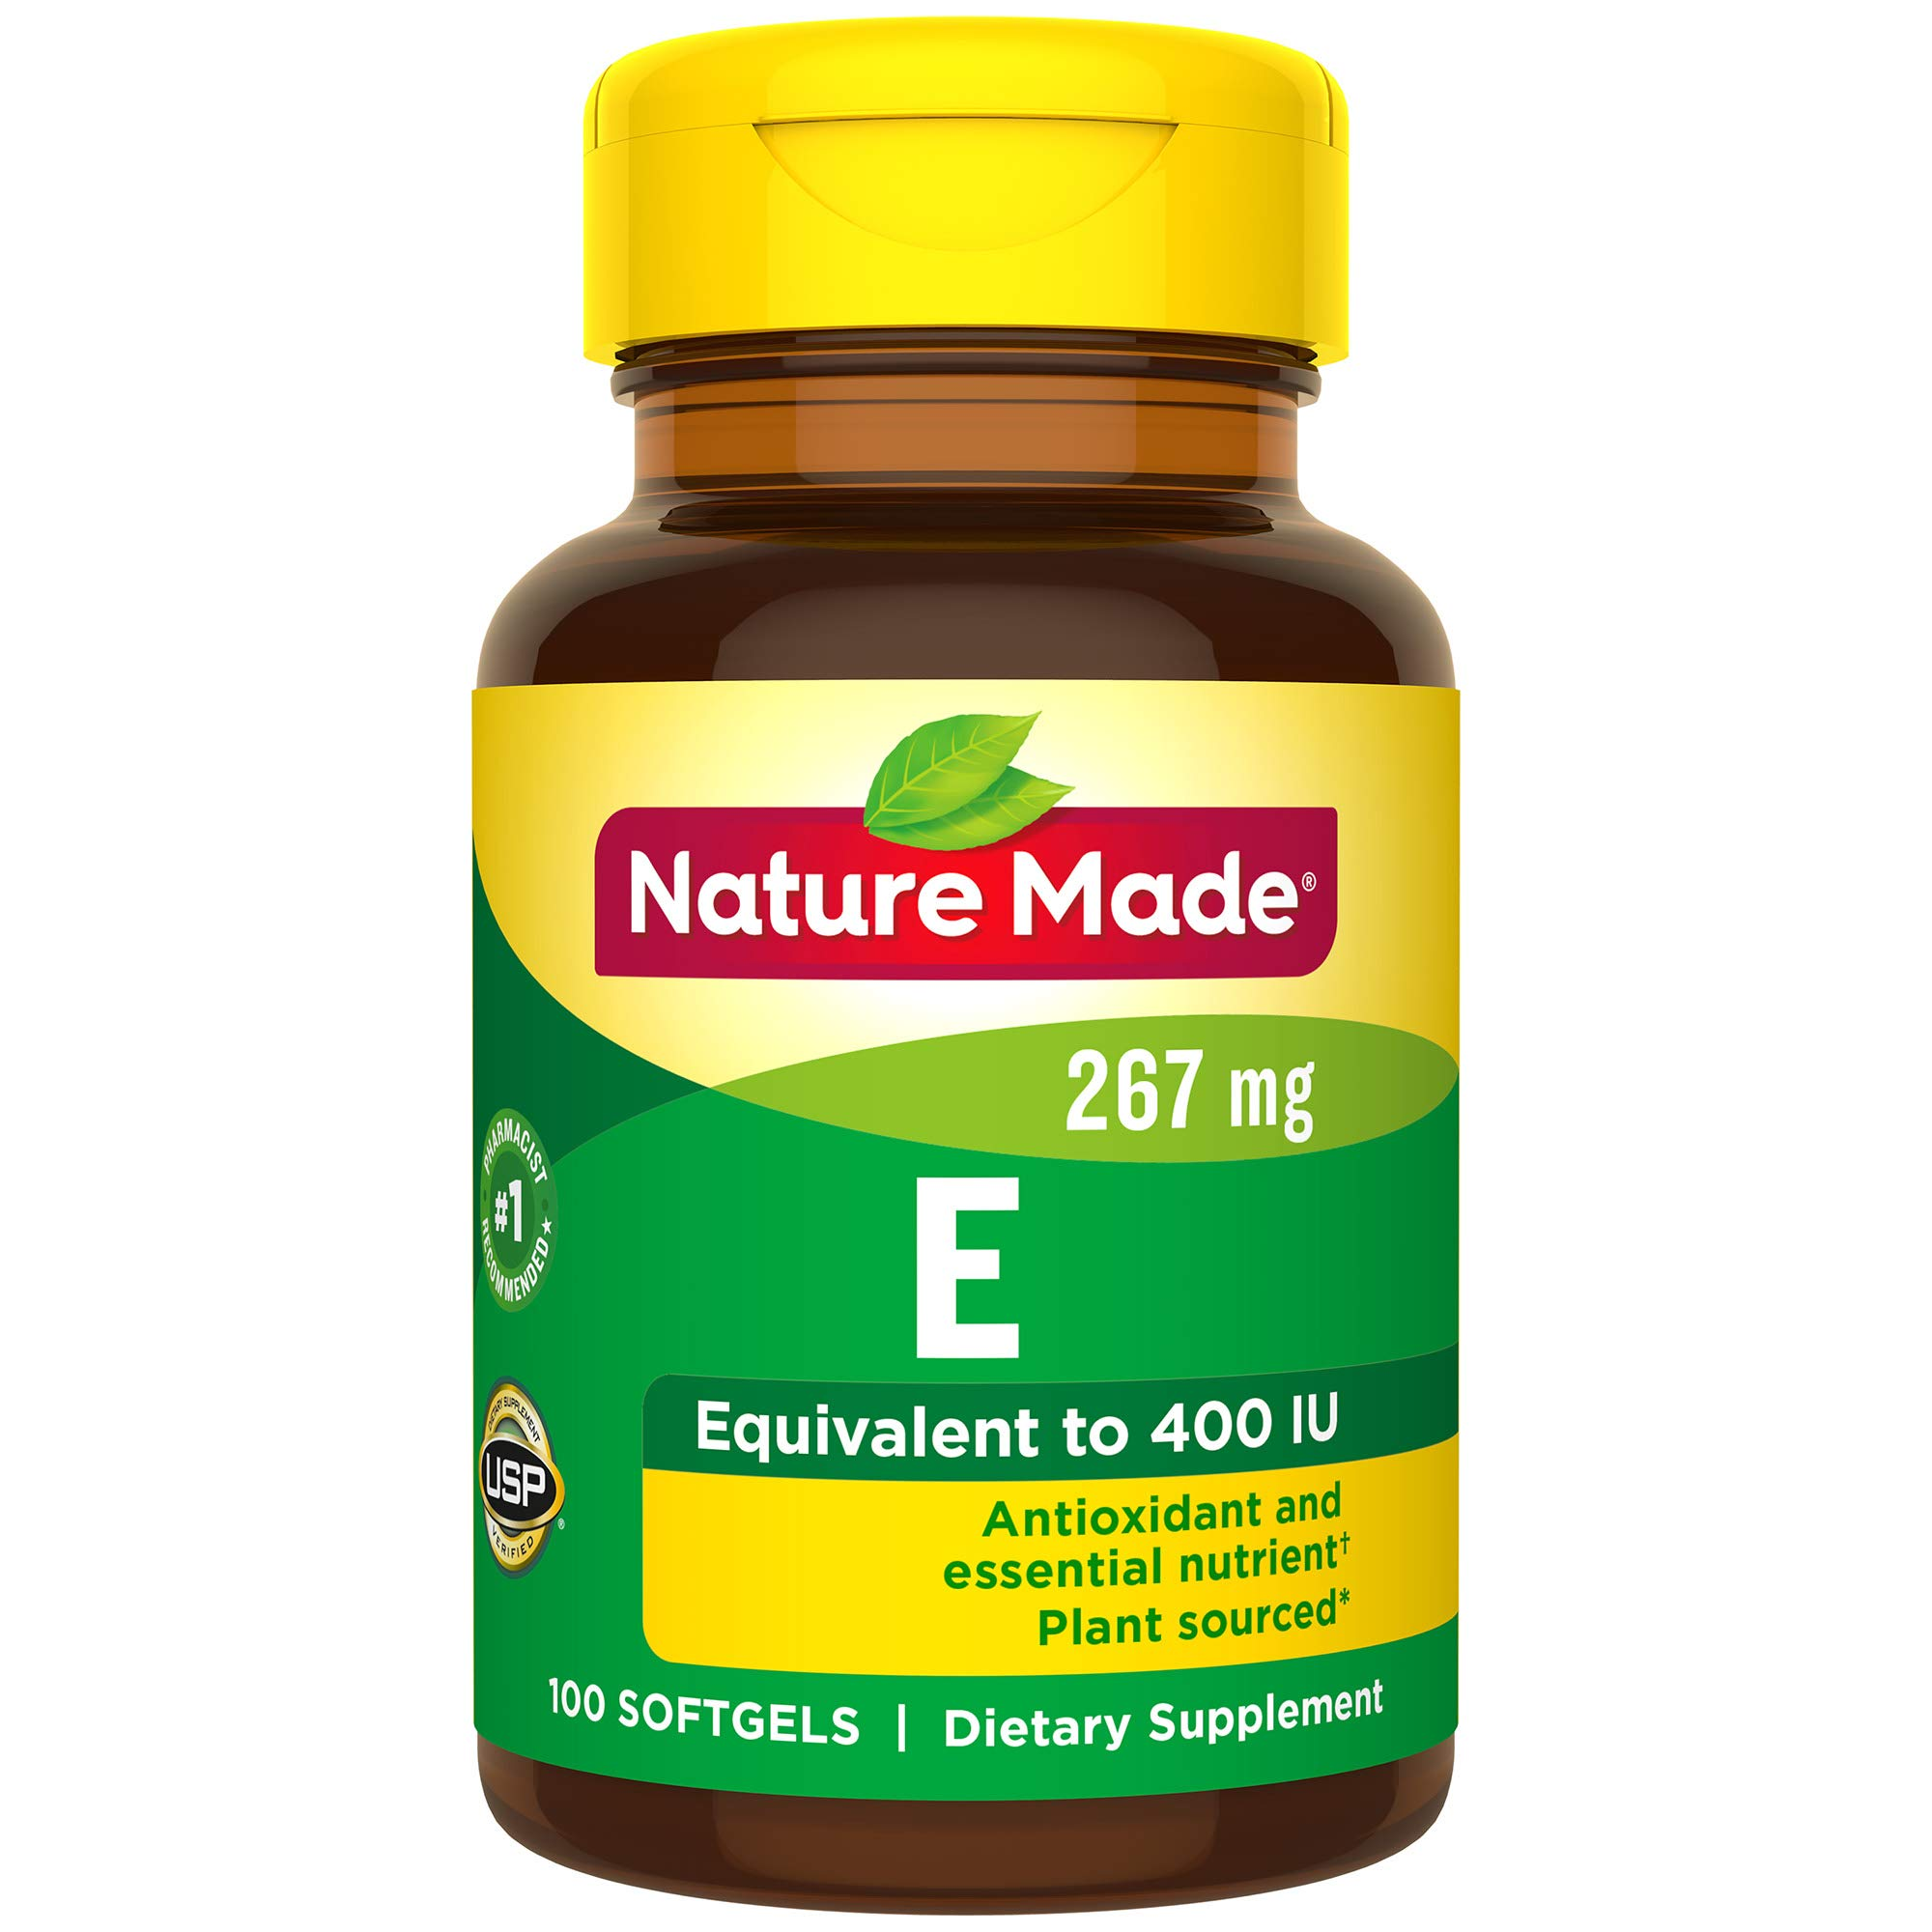 Nature Made Vitamin E 400 I.U. Softgels 100 Softgels (Pack of 3)